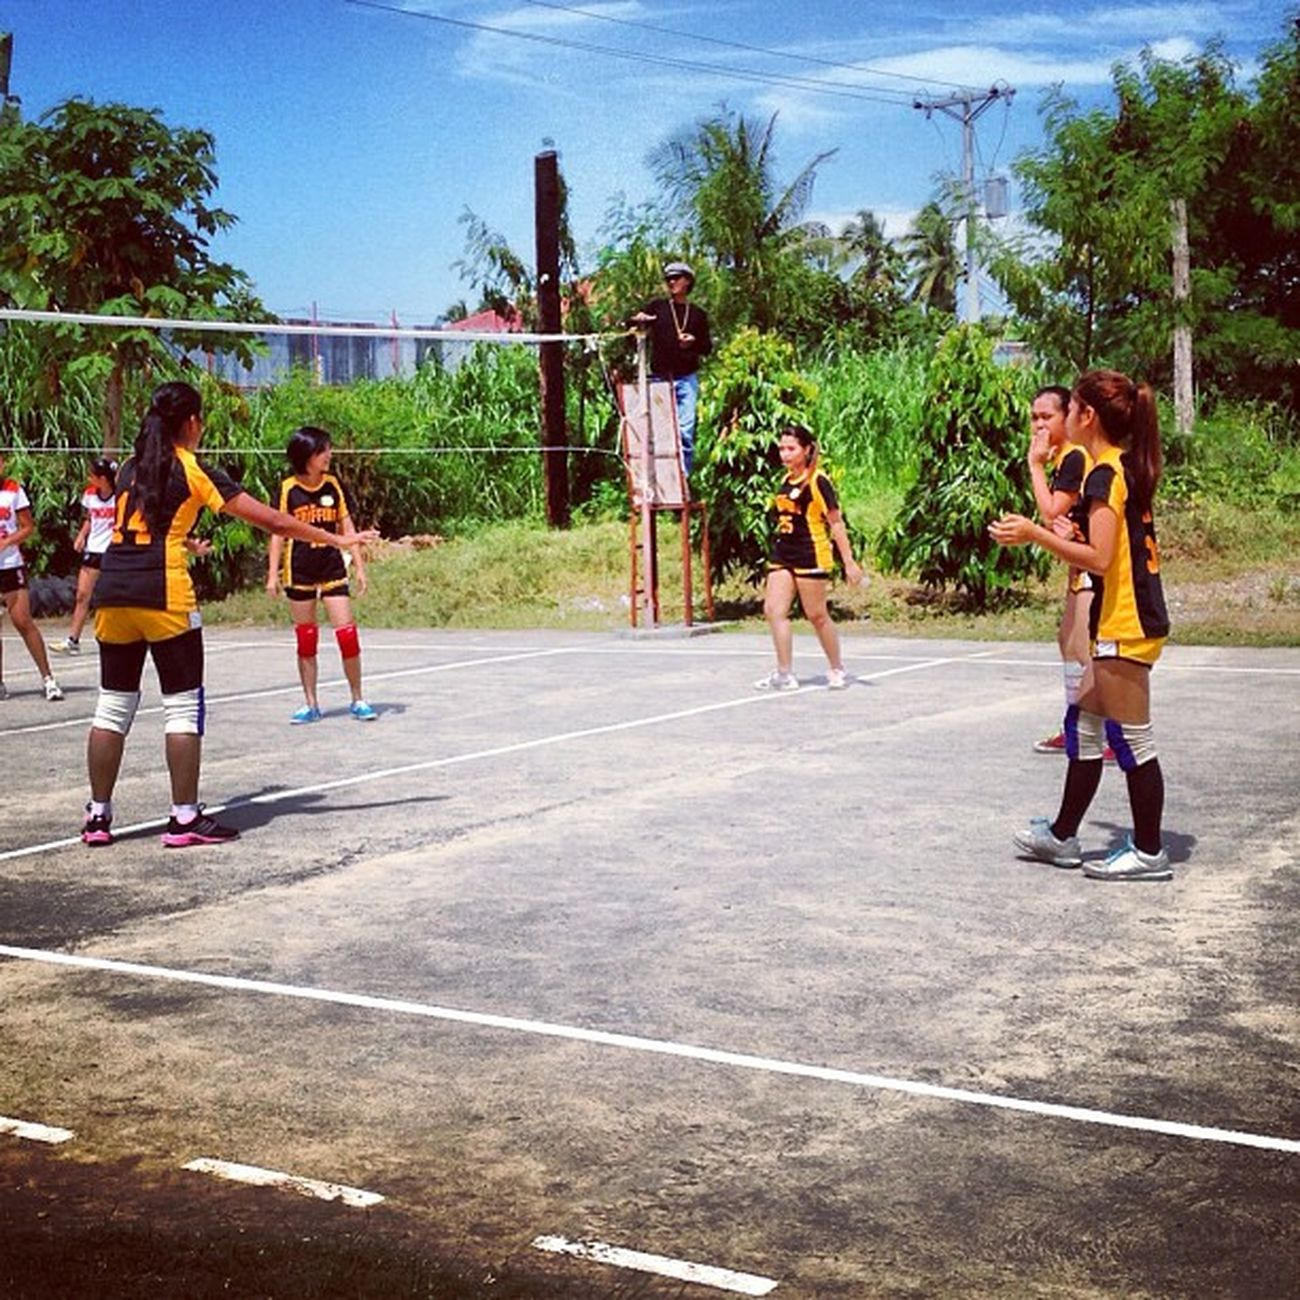 Sabot sa ta ug tarong. HAHAHAHA Volleyball Msuiitpalakasan2013 CBAAGRIFFINS